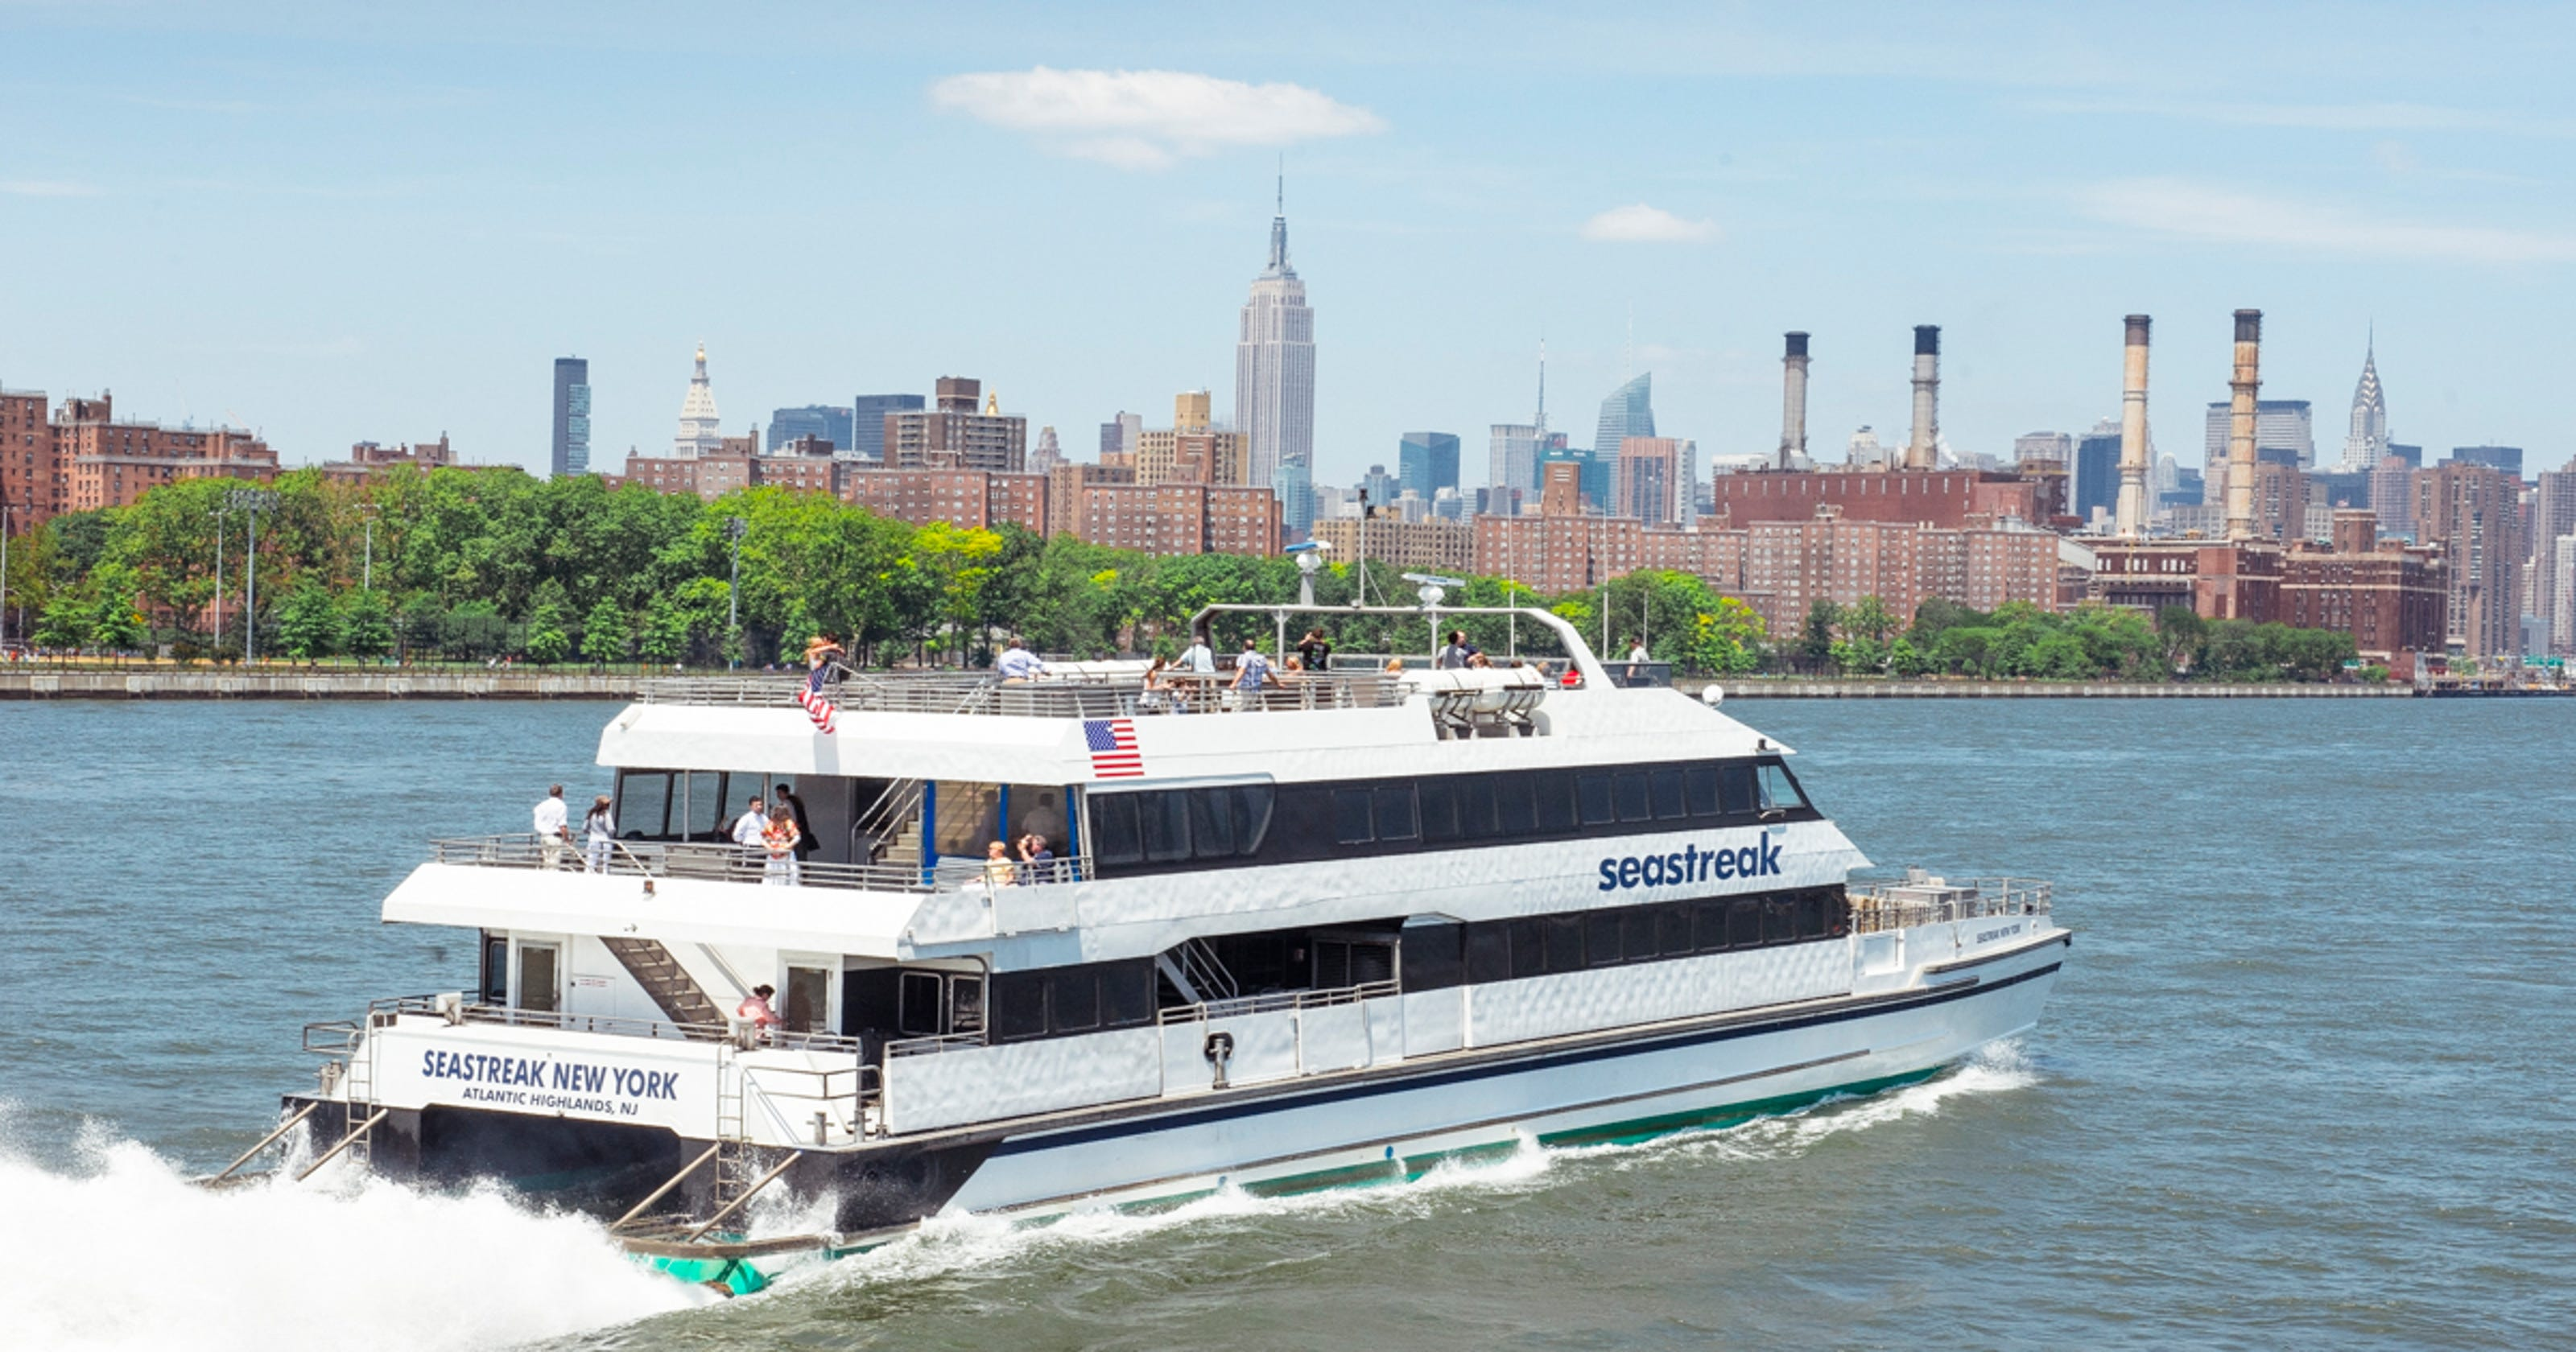 new seastreak 'luxury' ferry coming in 2017